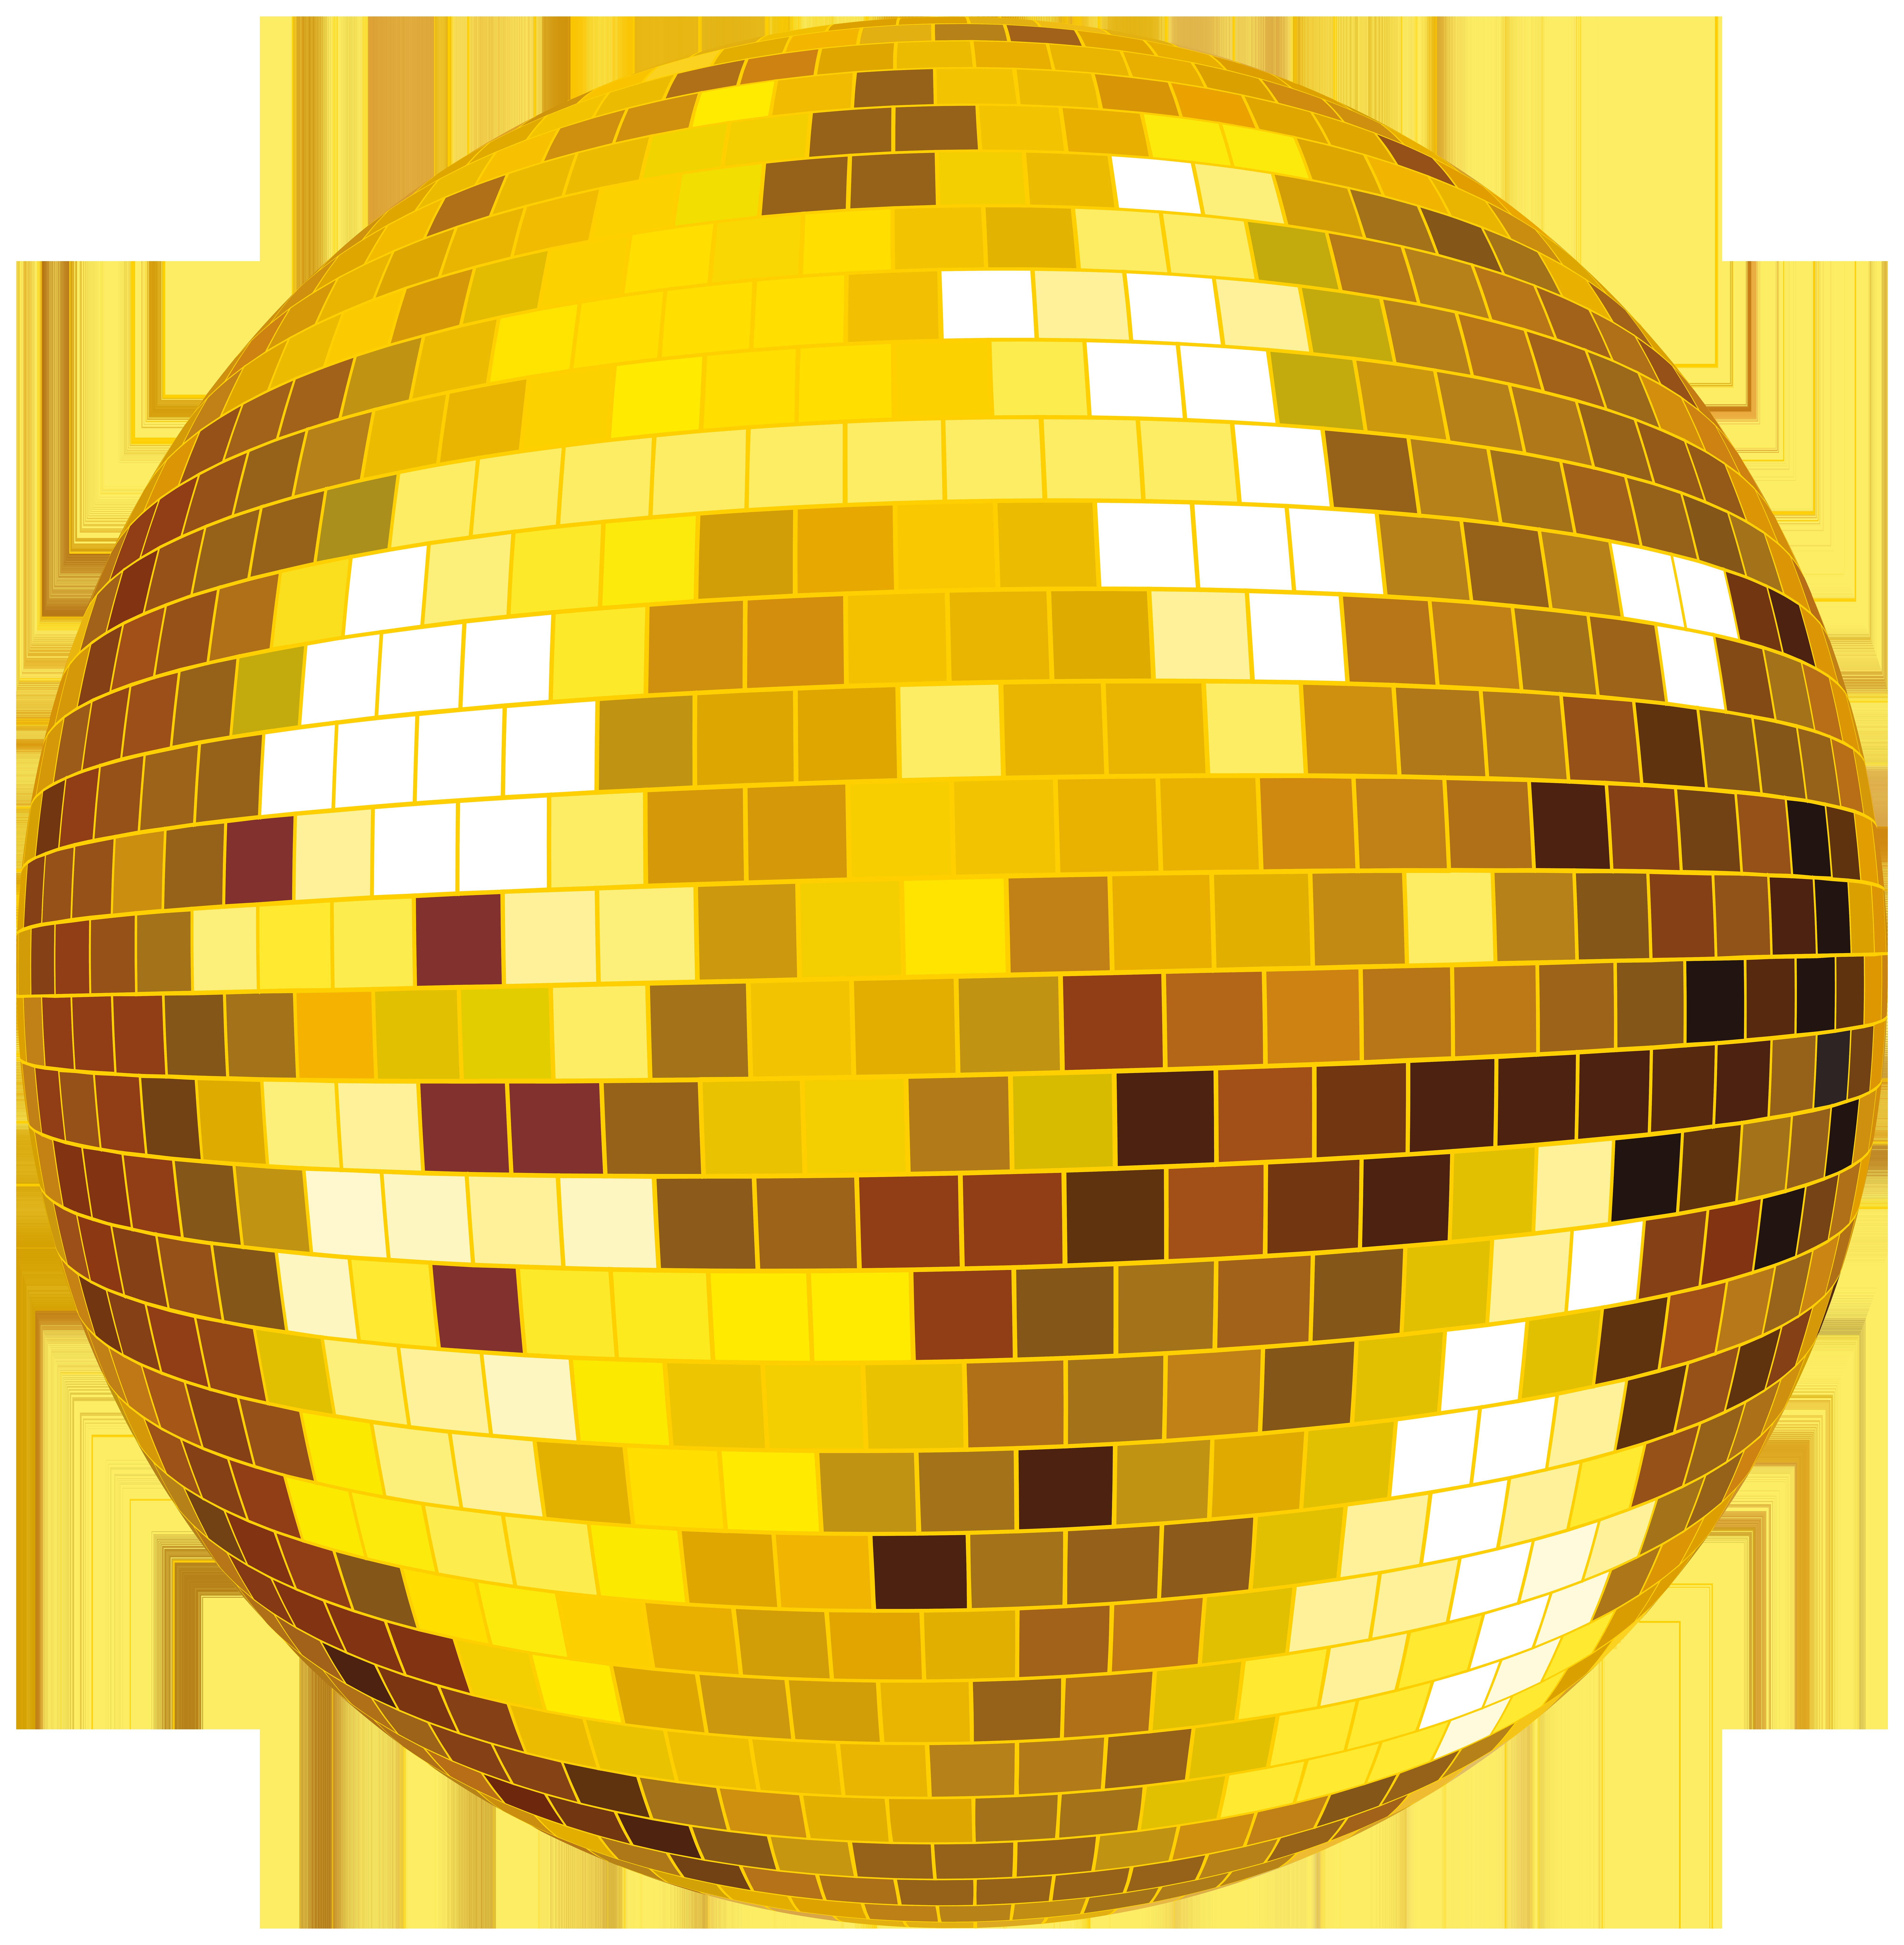 Disco clipart disco ball. Png clip art image